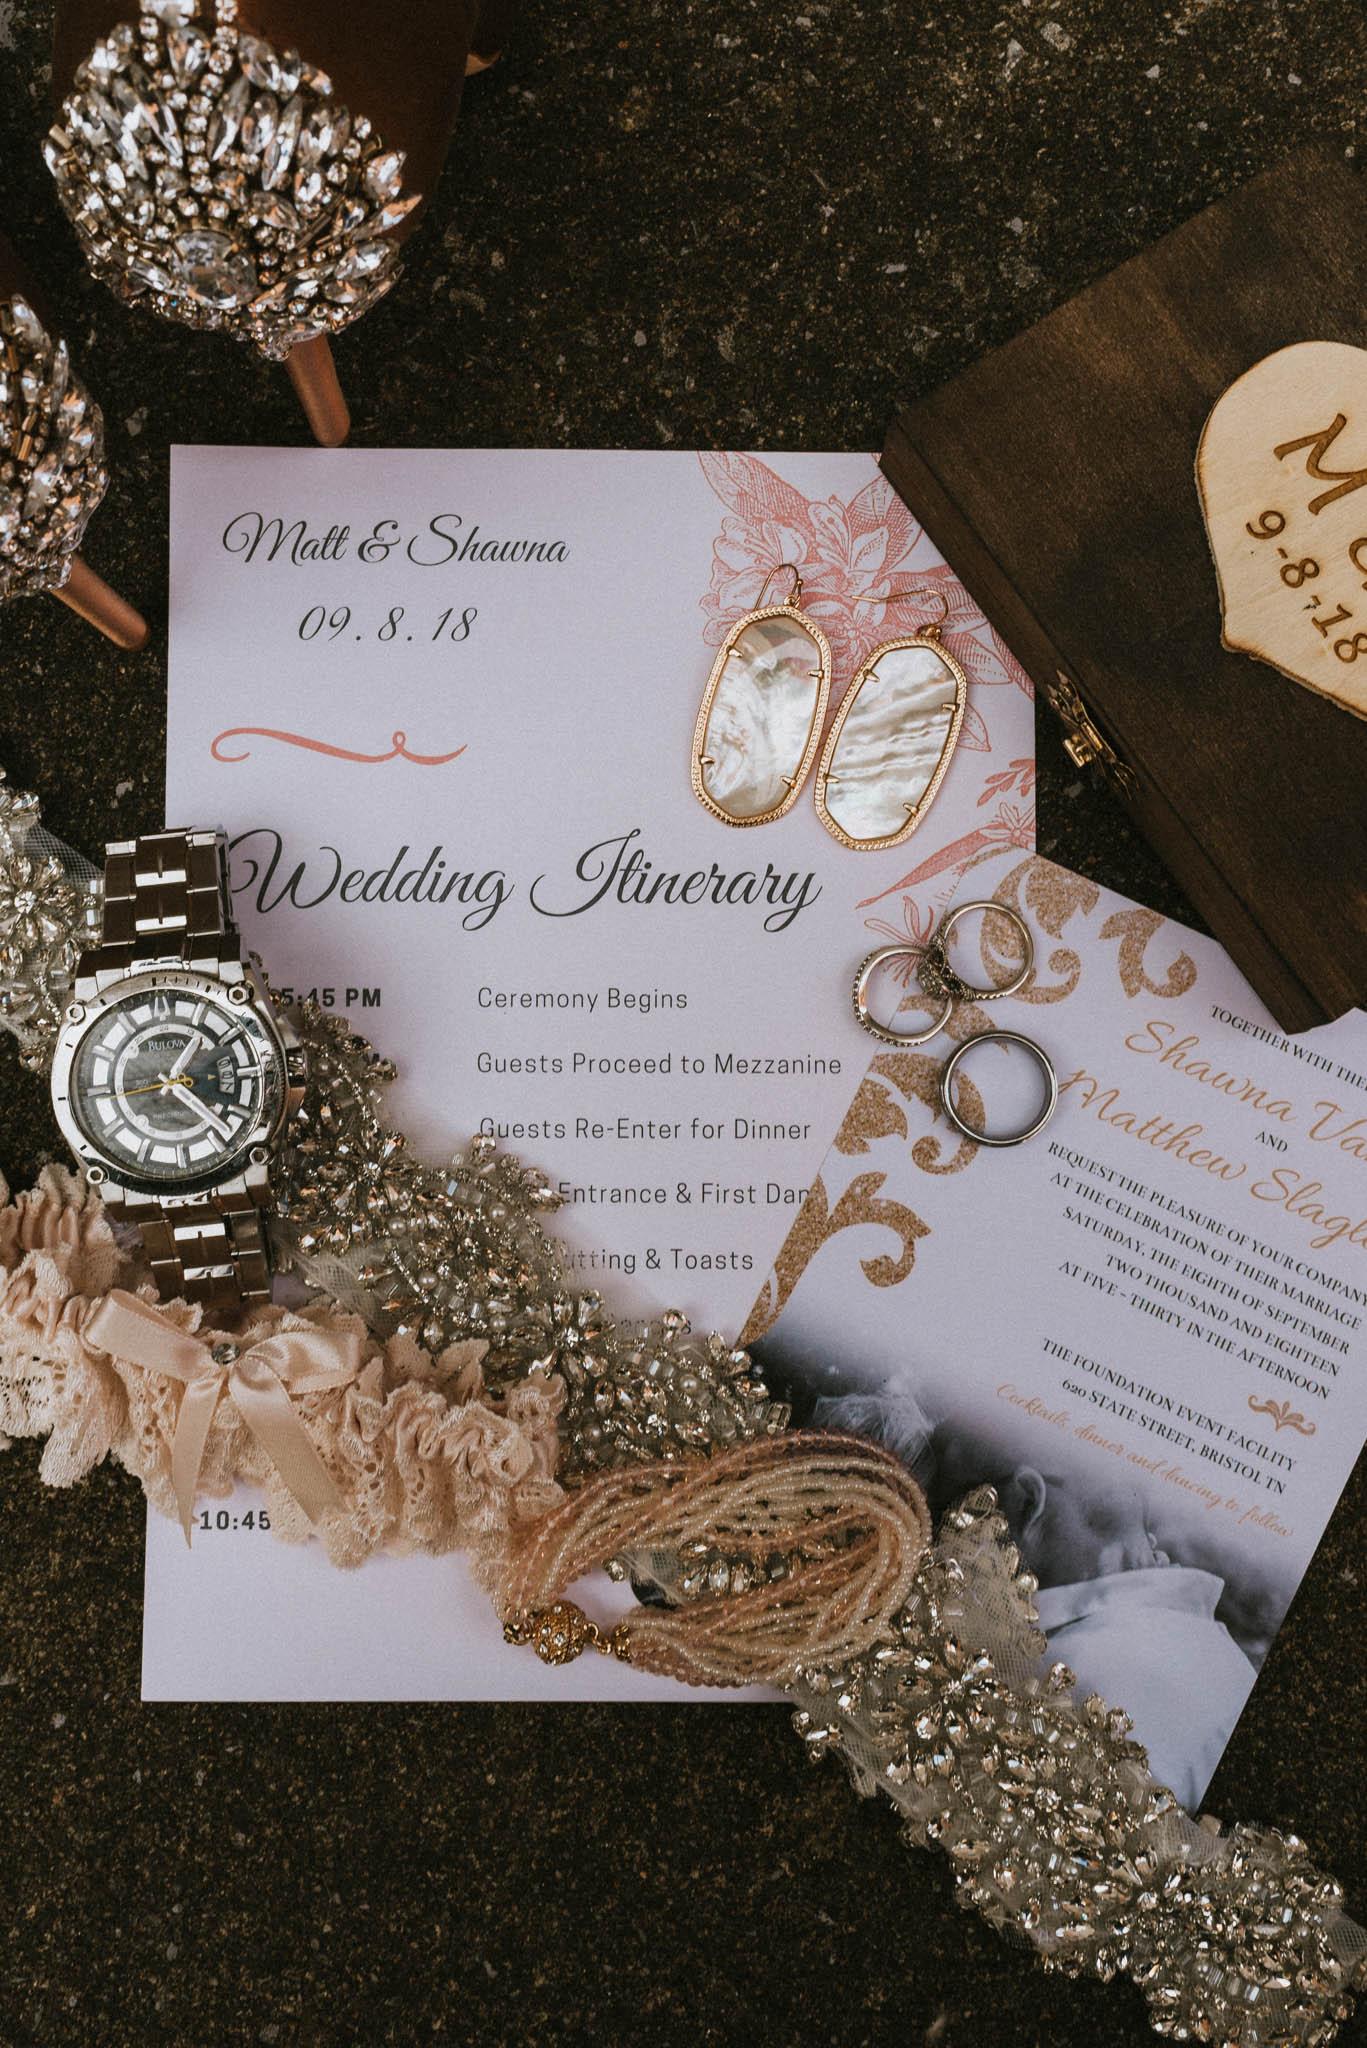 The Foundation Event Facility Wedding, Bristol, TN, Northeast Tennessee Wedding Photographer, East Tennessee Wedding Photographer, Knoxville, TN Wedding Photographer